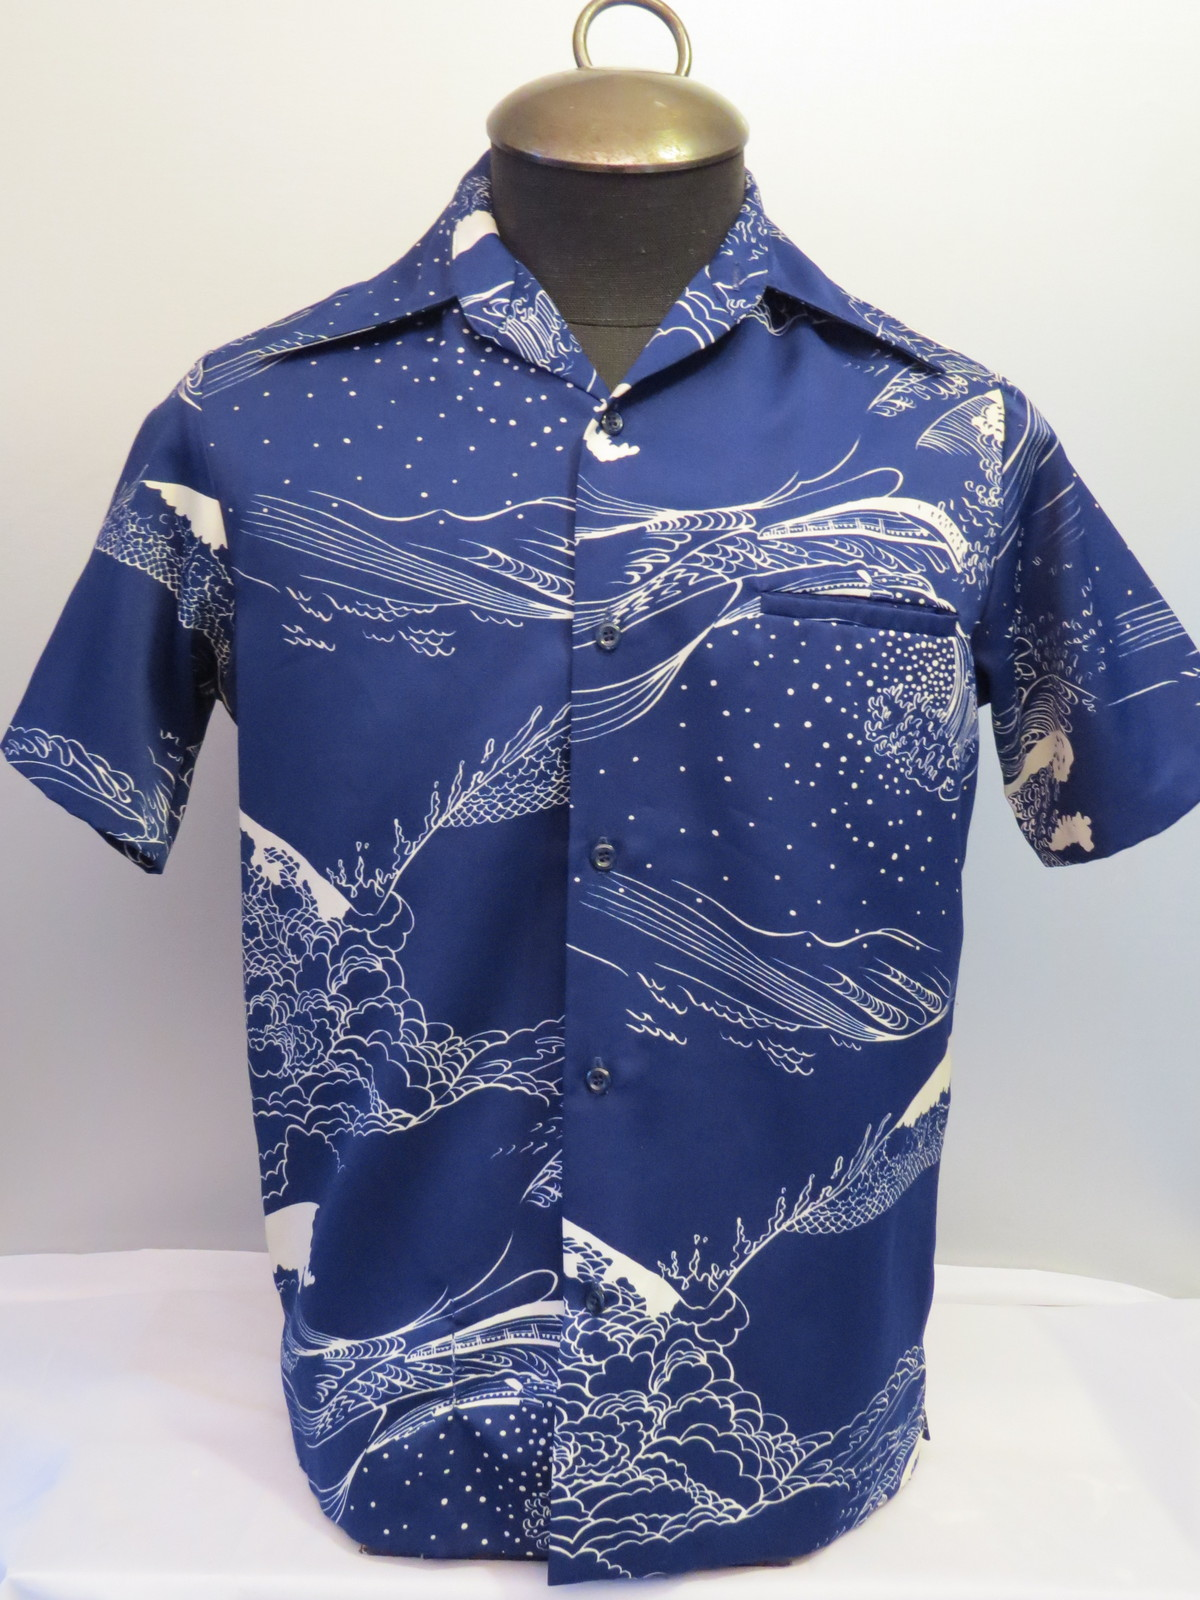 10e203b35 Vintage Tori Richards Hawaiian Shirt - Ocean Surf and Canoe Design - Men's  Small